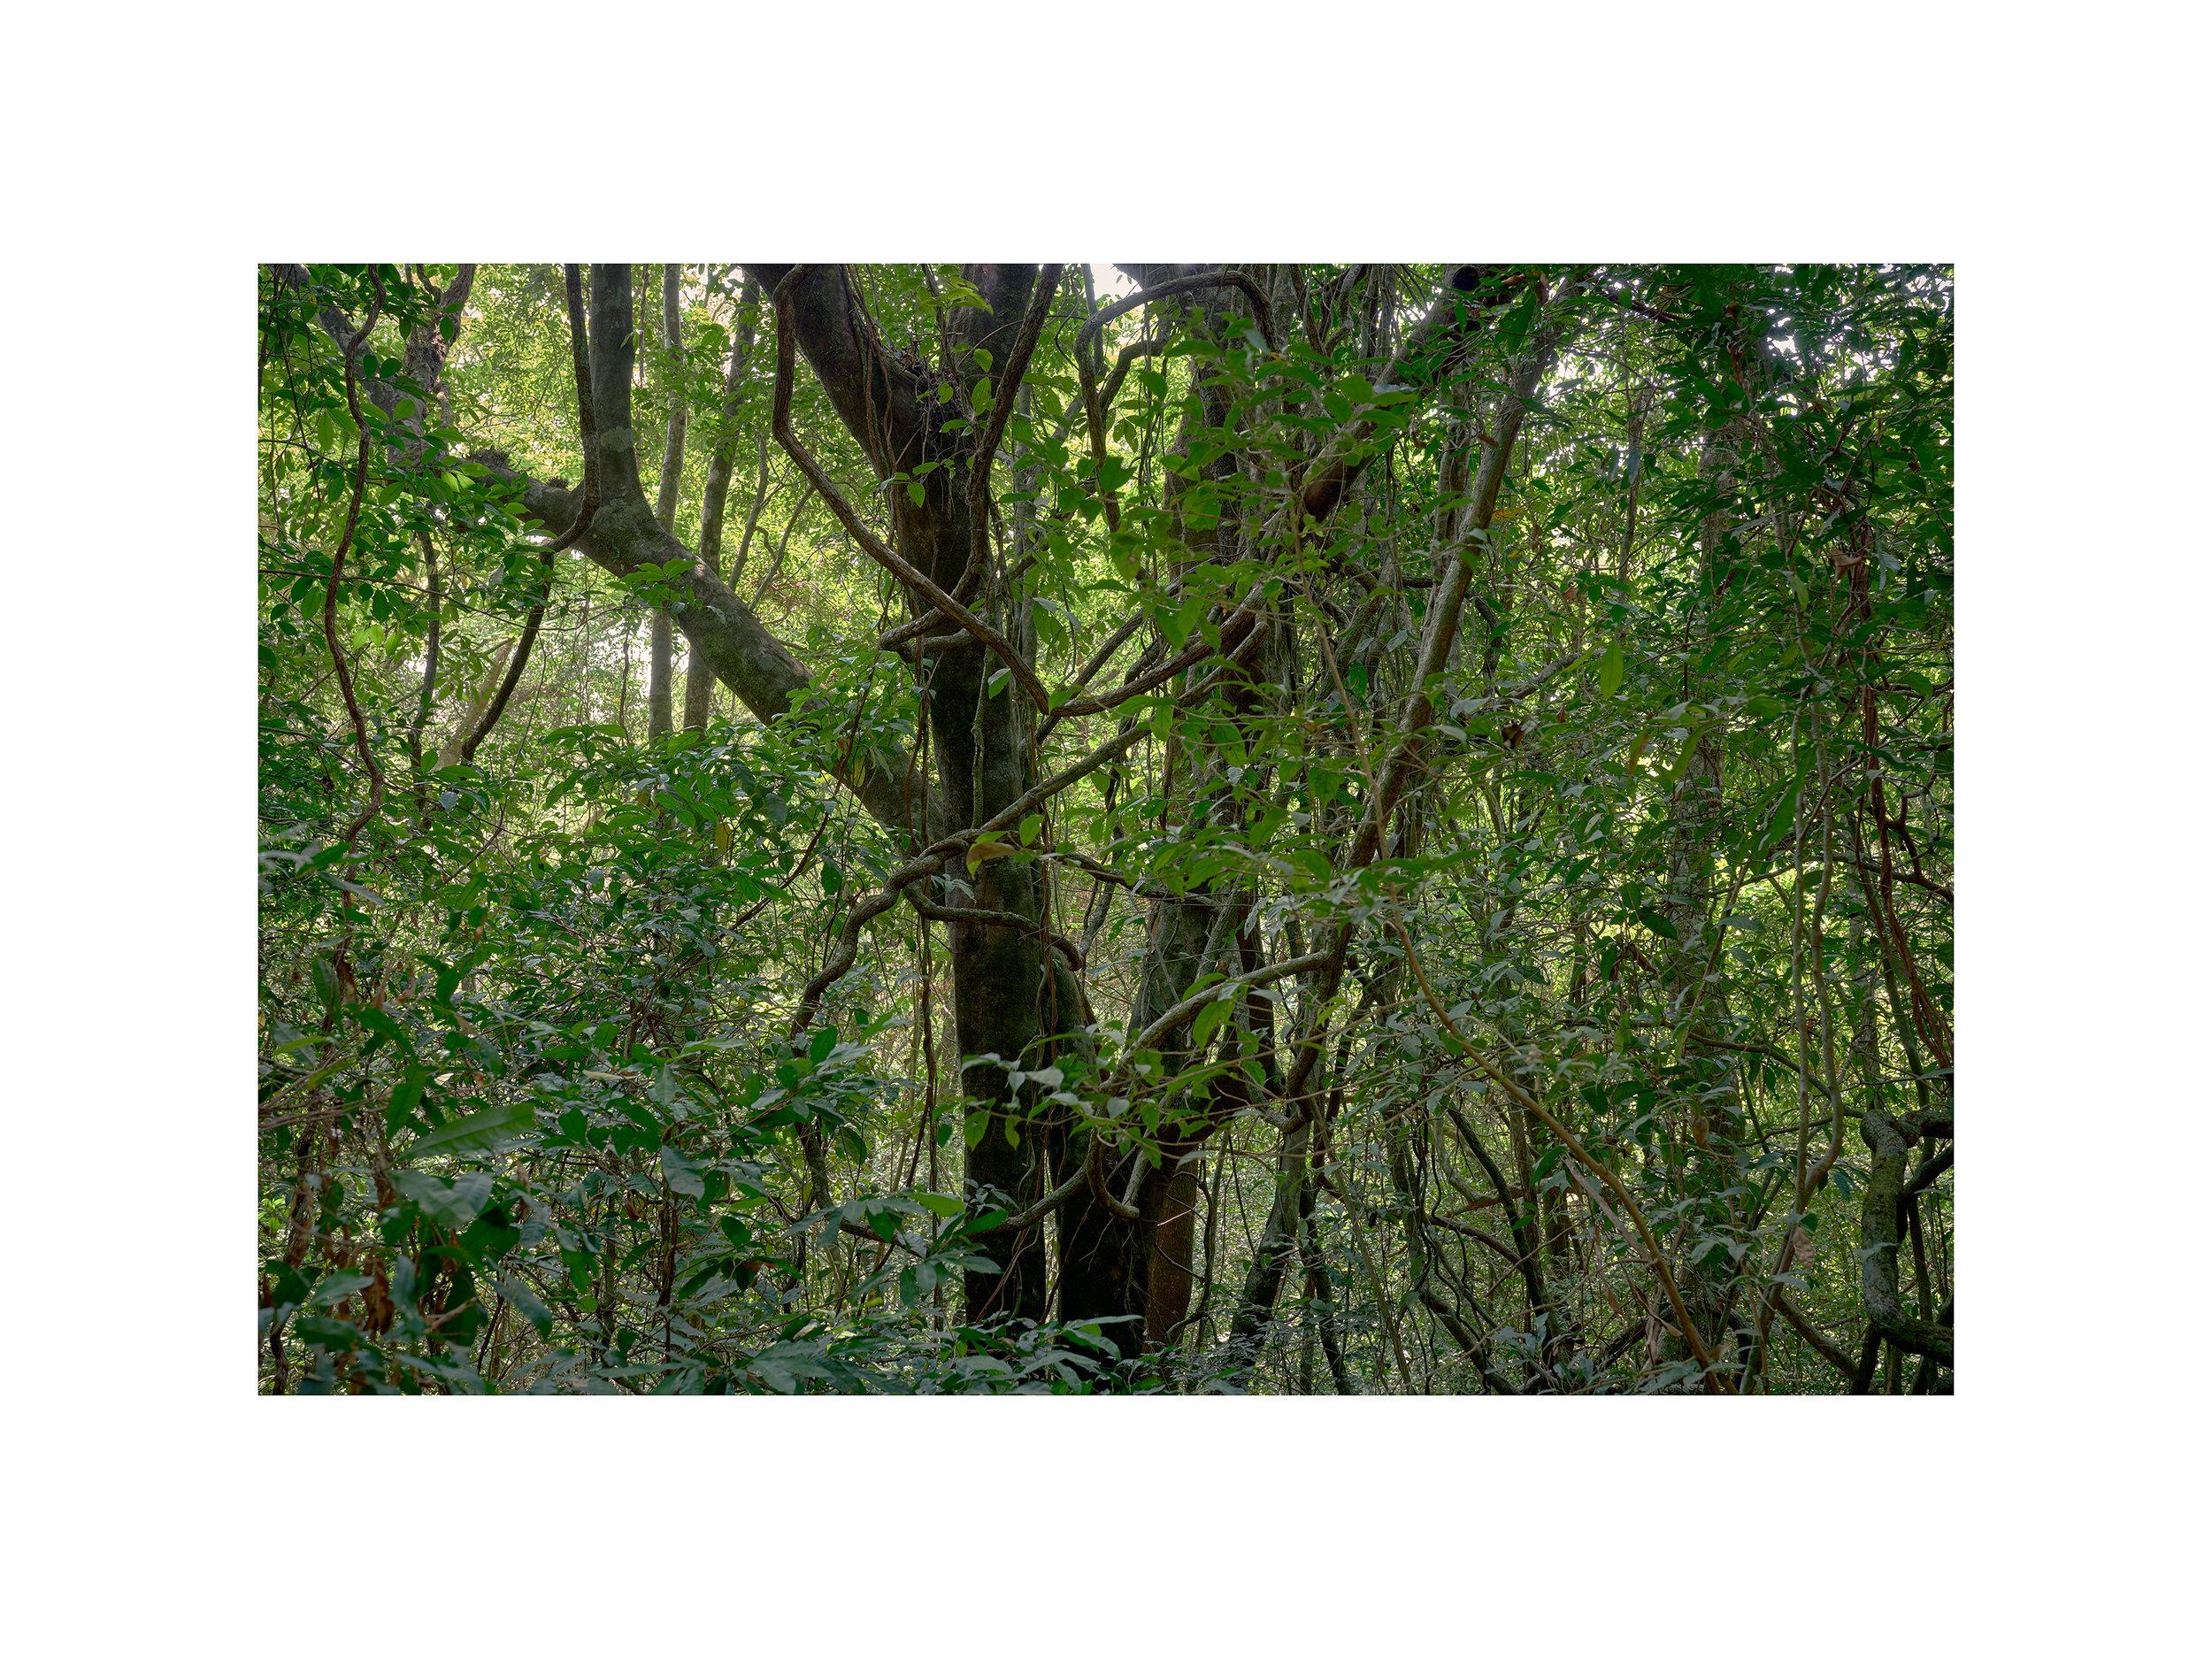 Rainforest no. 4